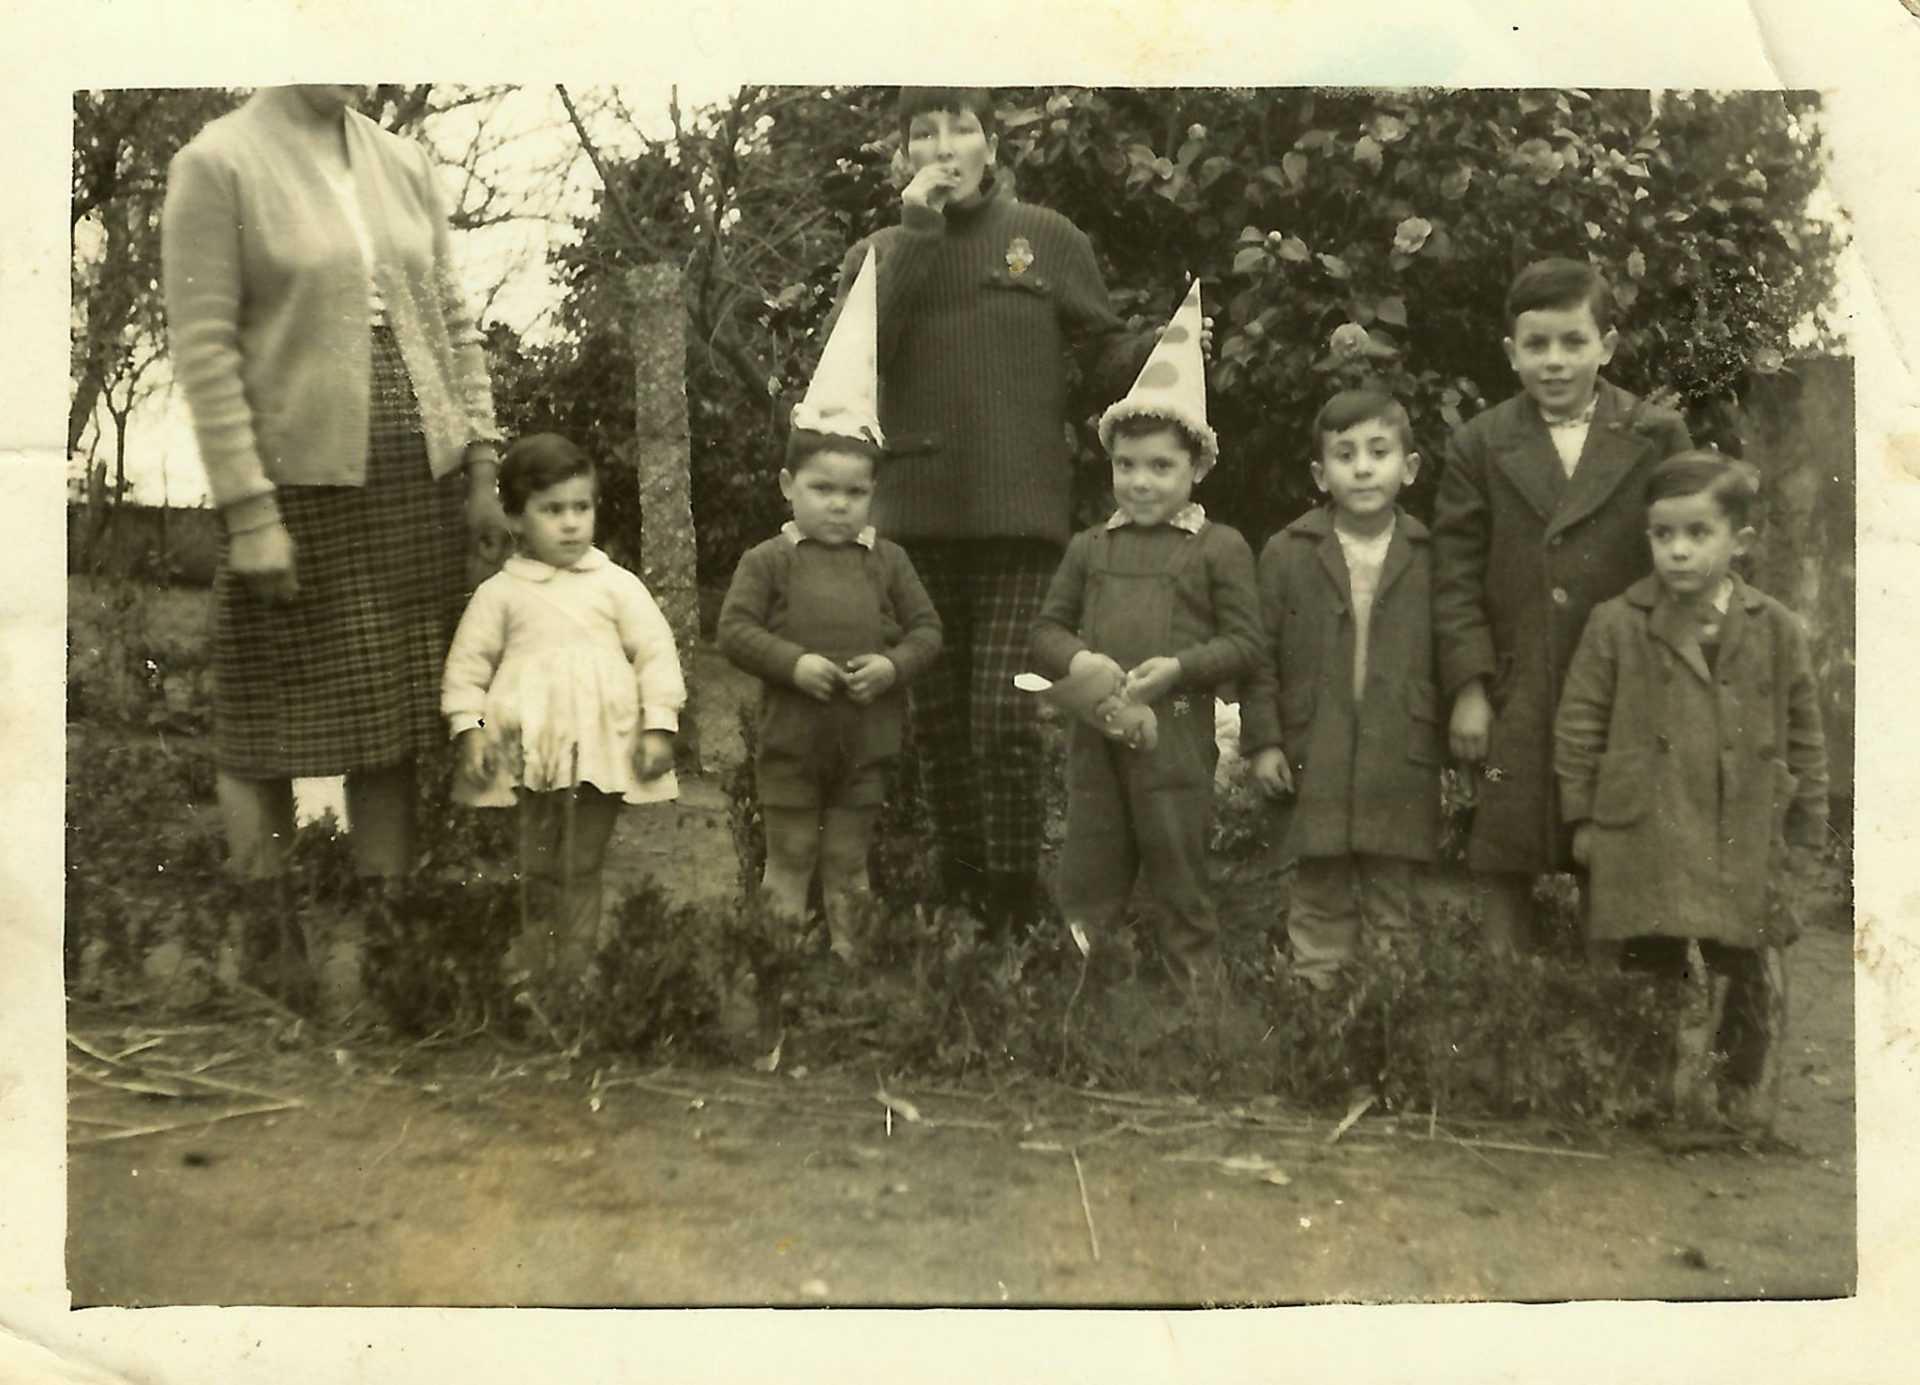 Mª del Carmen del Valle del Río, cun grupo de nenos e nenas de Pidre